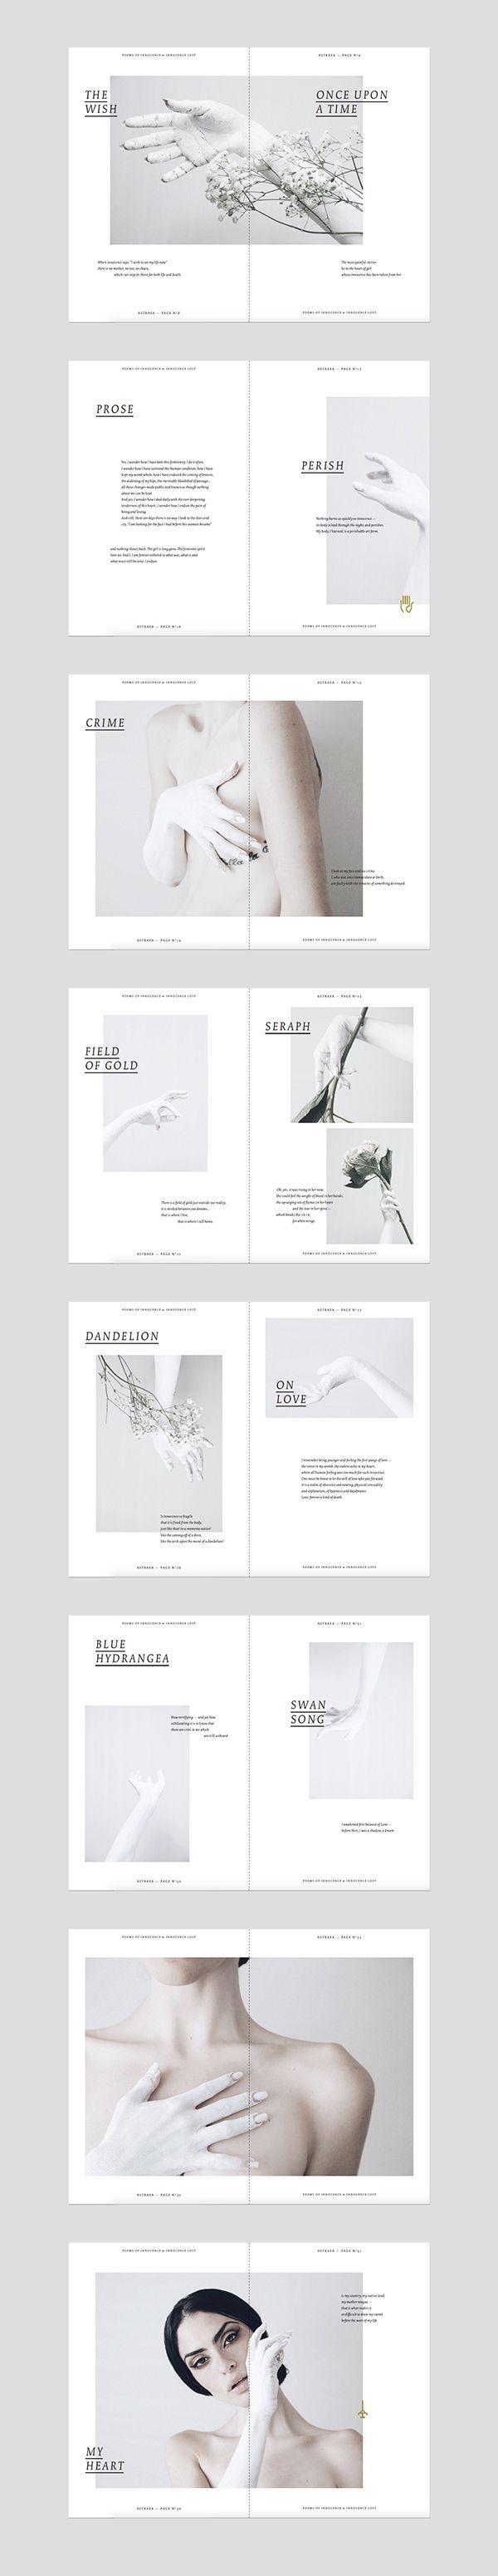 ASTRAEA on Editorial Design Served